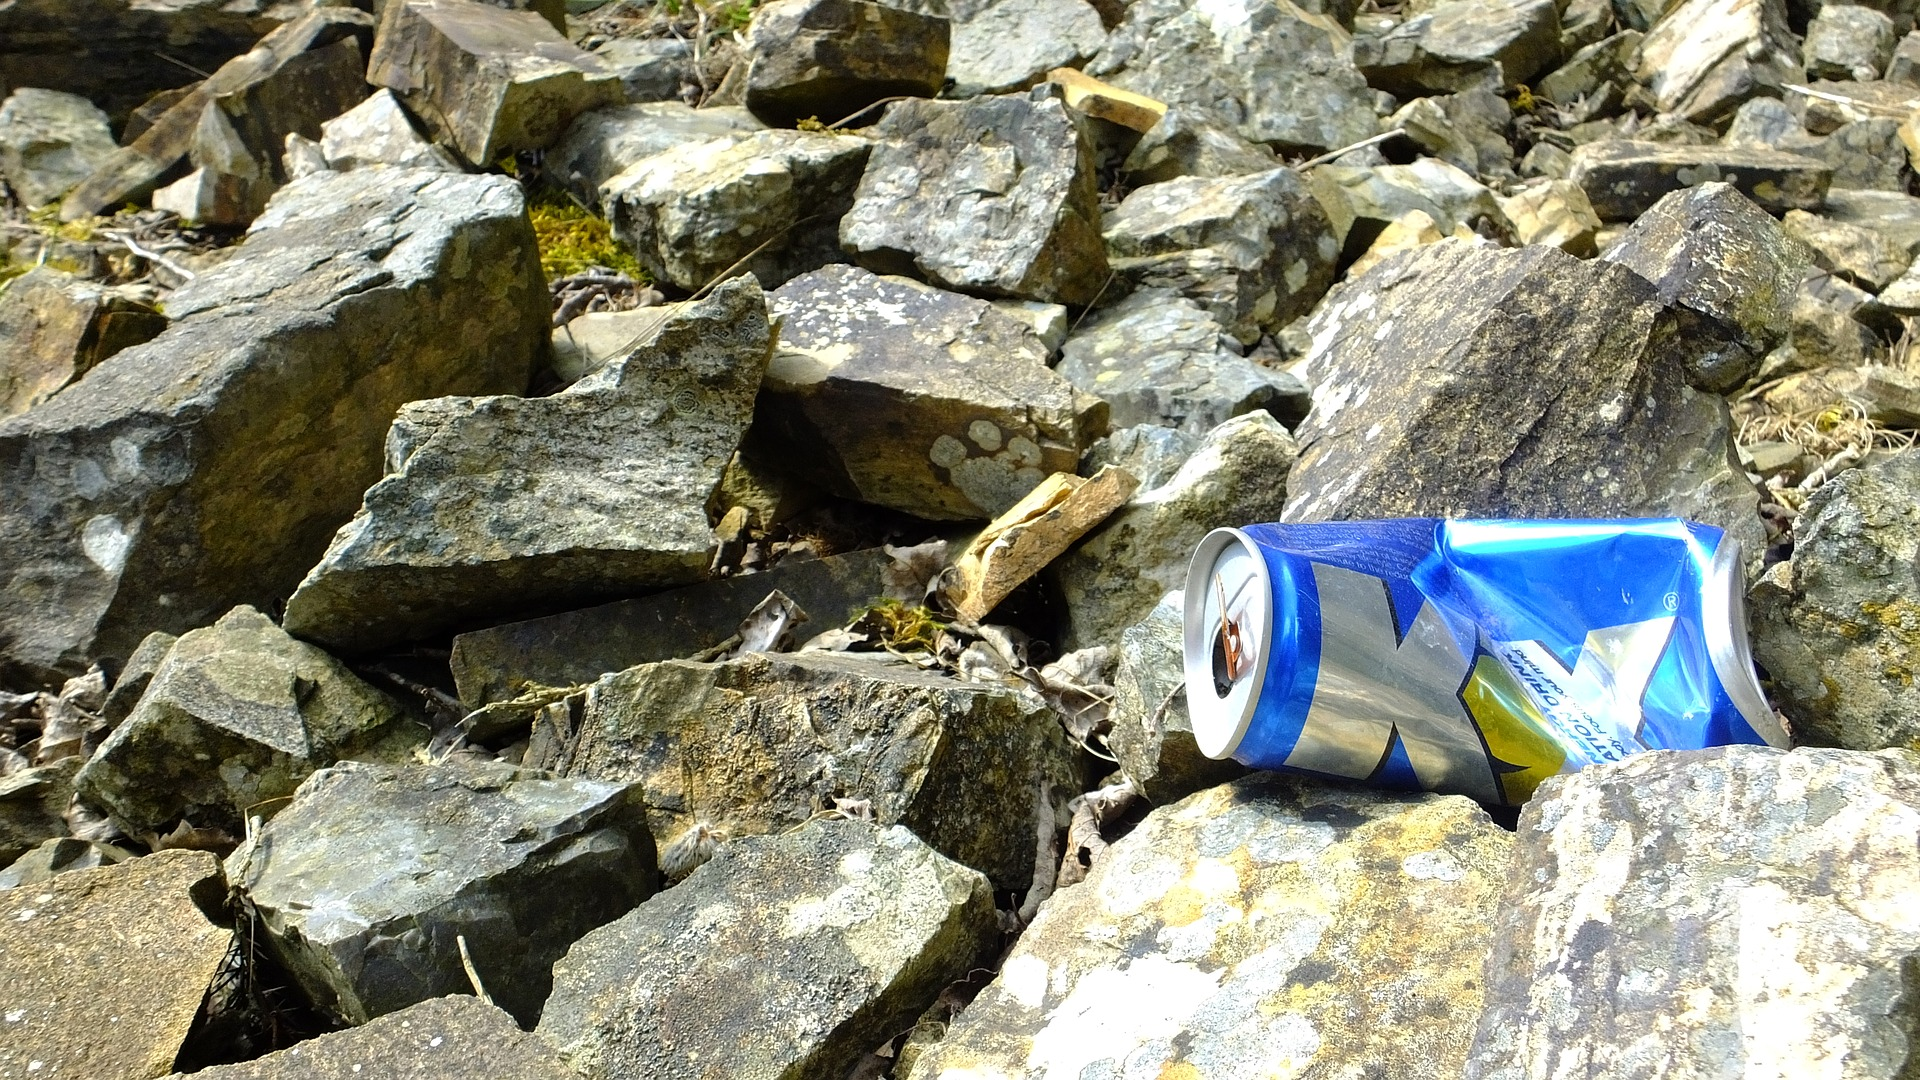 Aluminium can littered on rocks